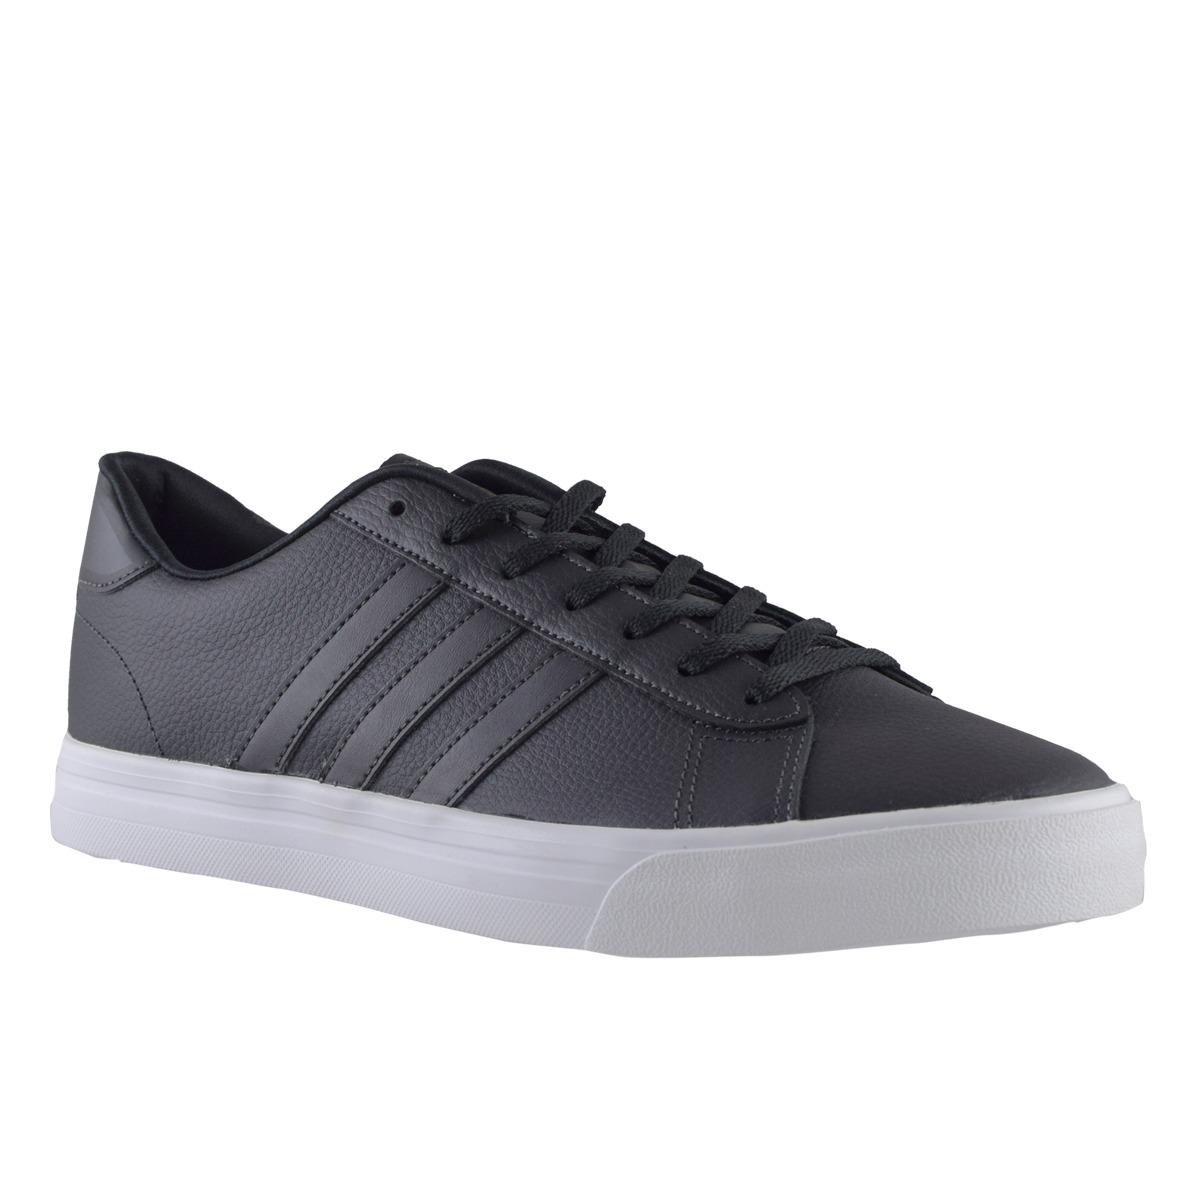 purchase cheap 786d6 cfff6 zapatillas adidas neo super daily hombre. Cargando zoom.